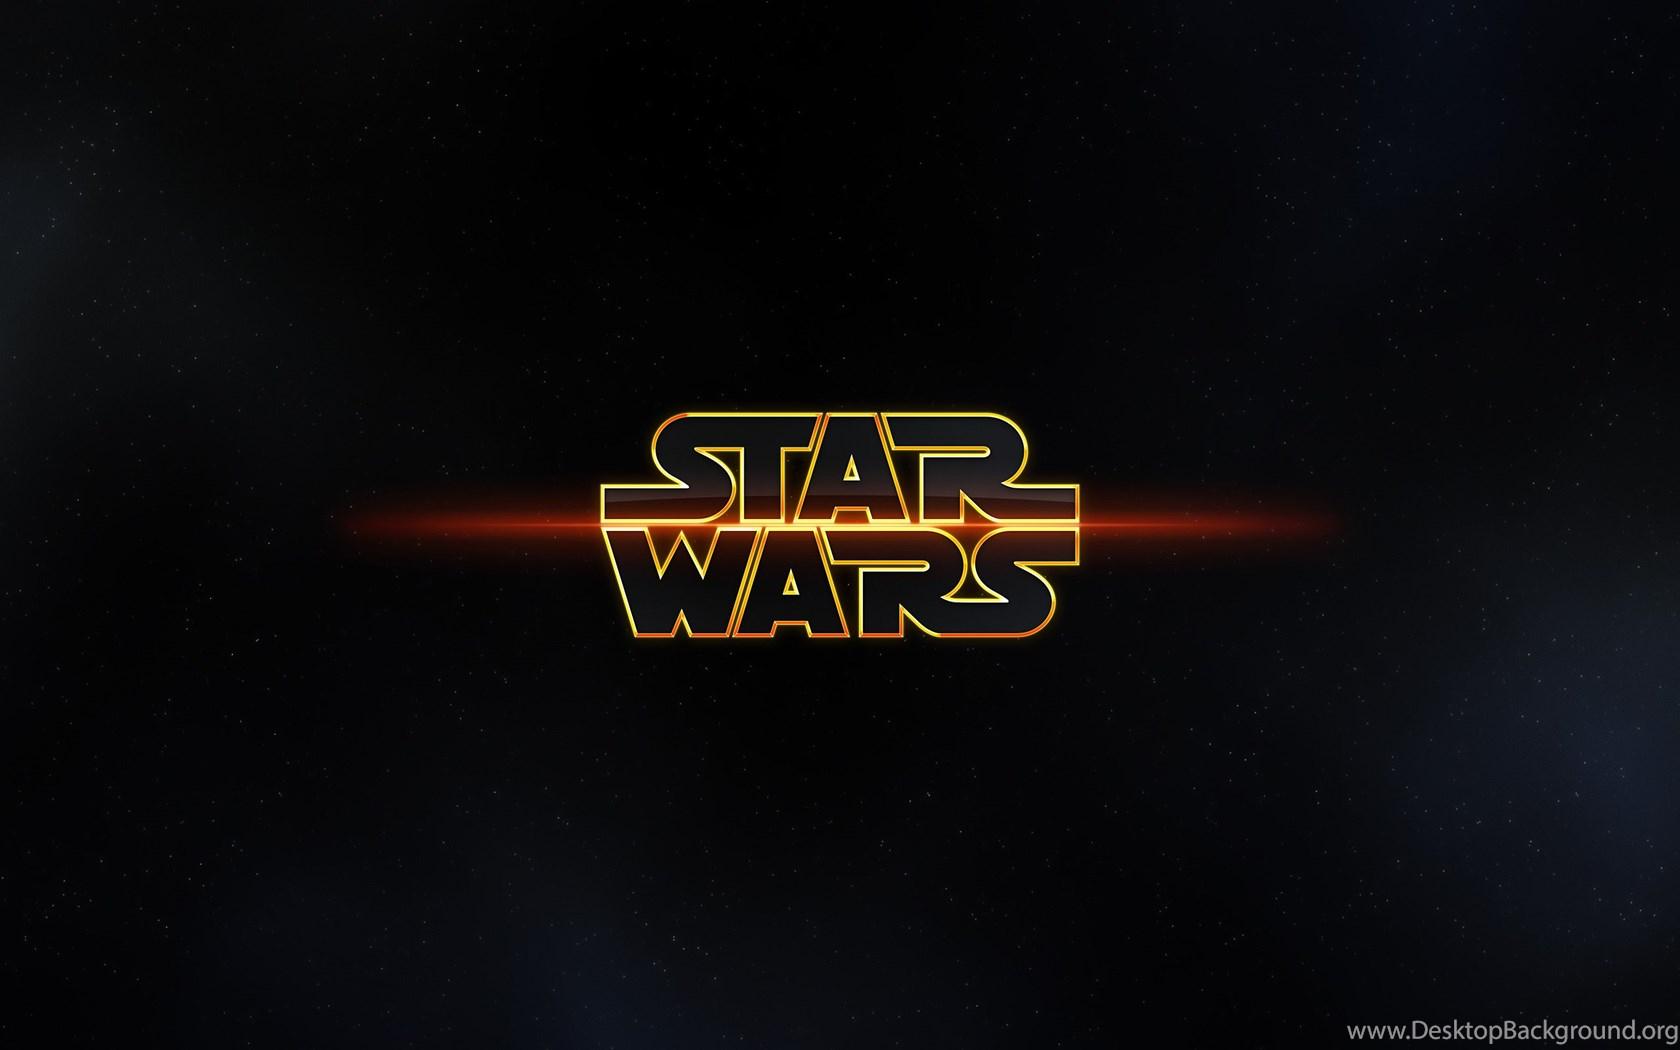 Download The Star Wars Wallpaper Iphone Jpg 1680x1050 Wallpapers